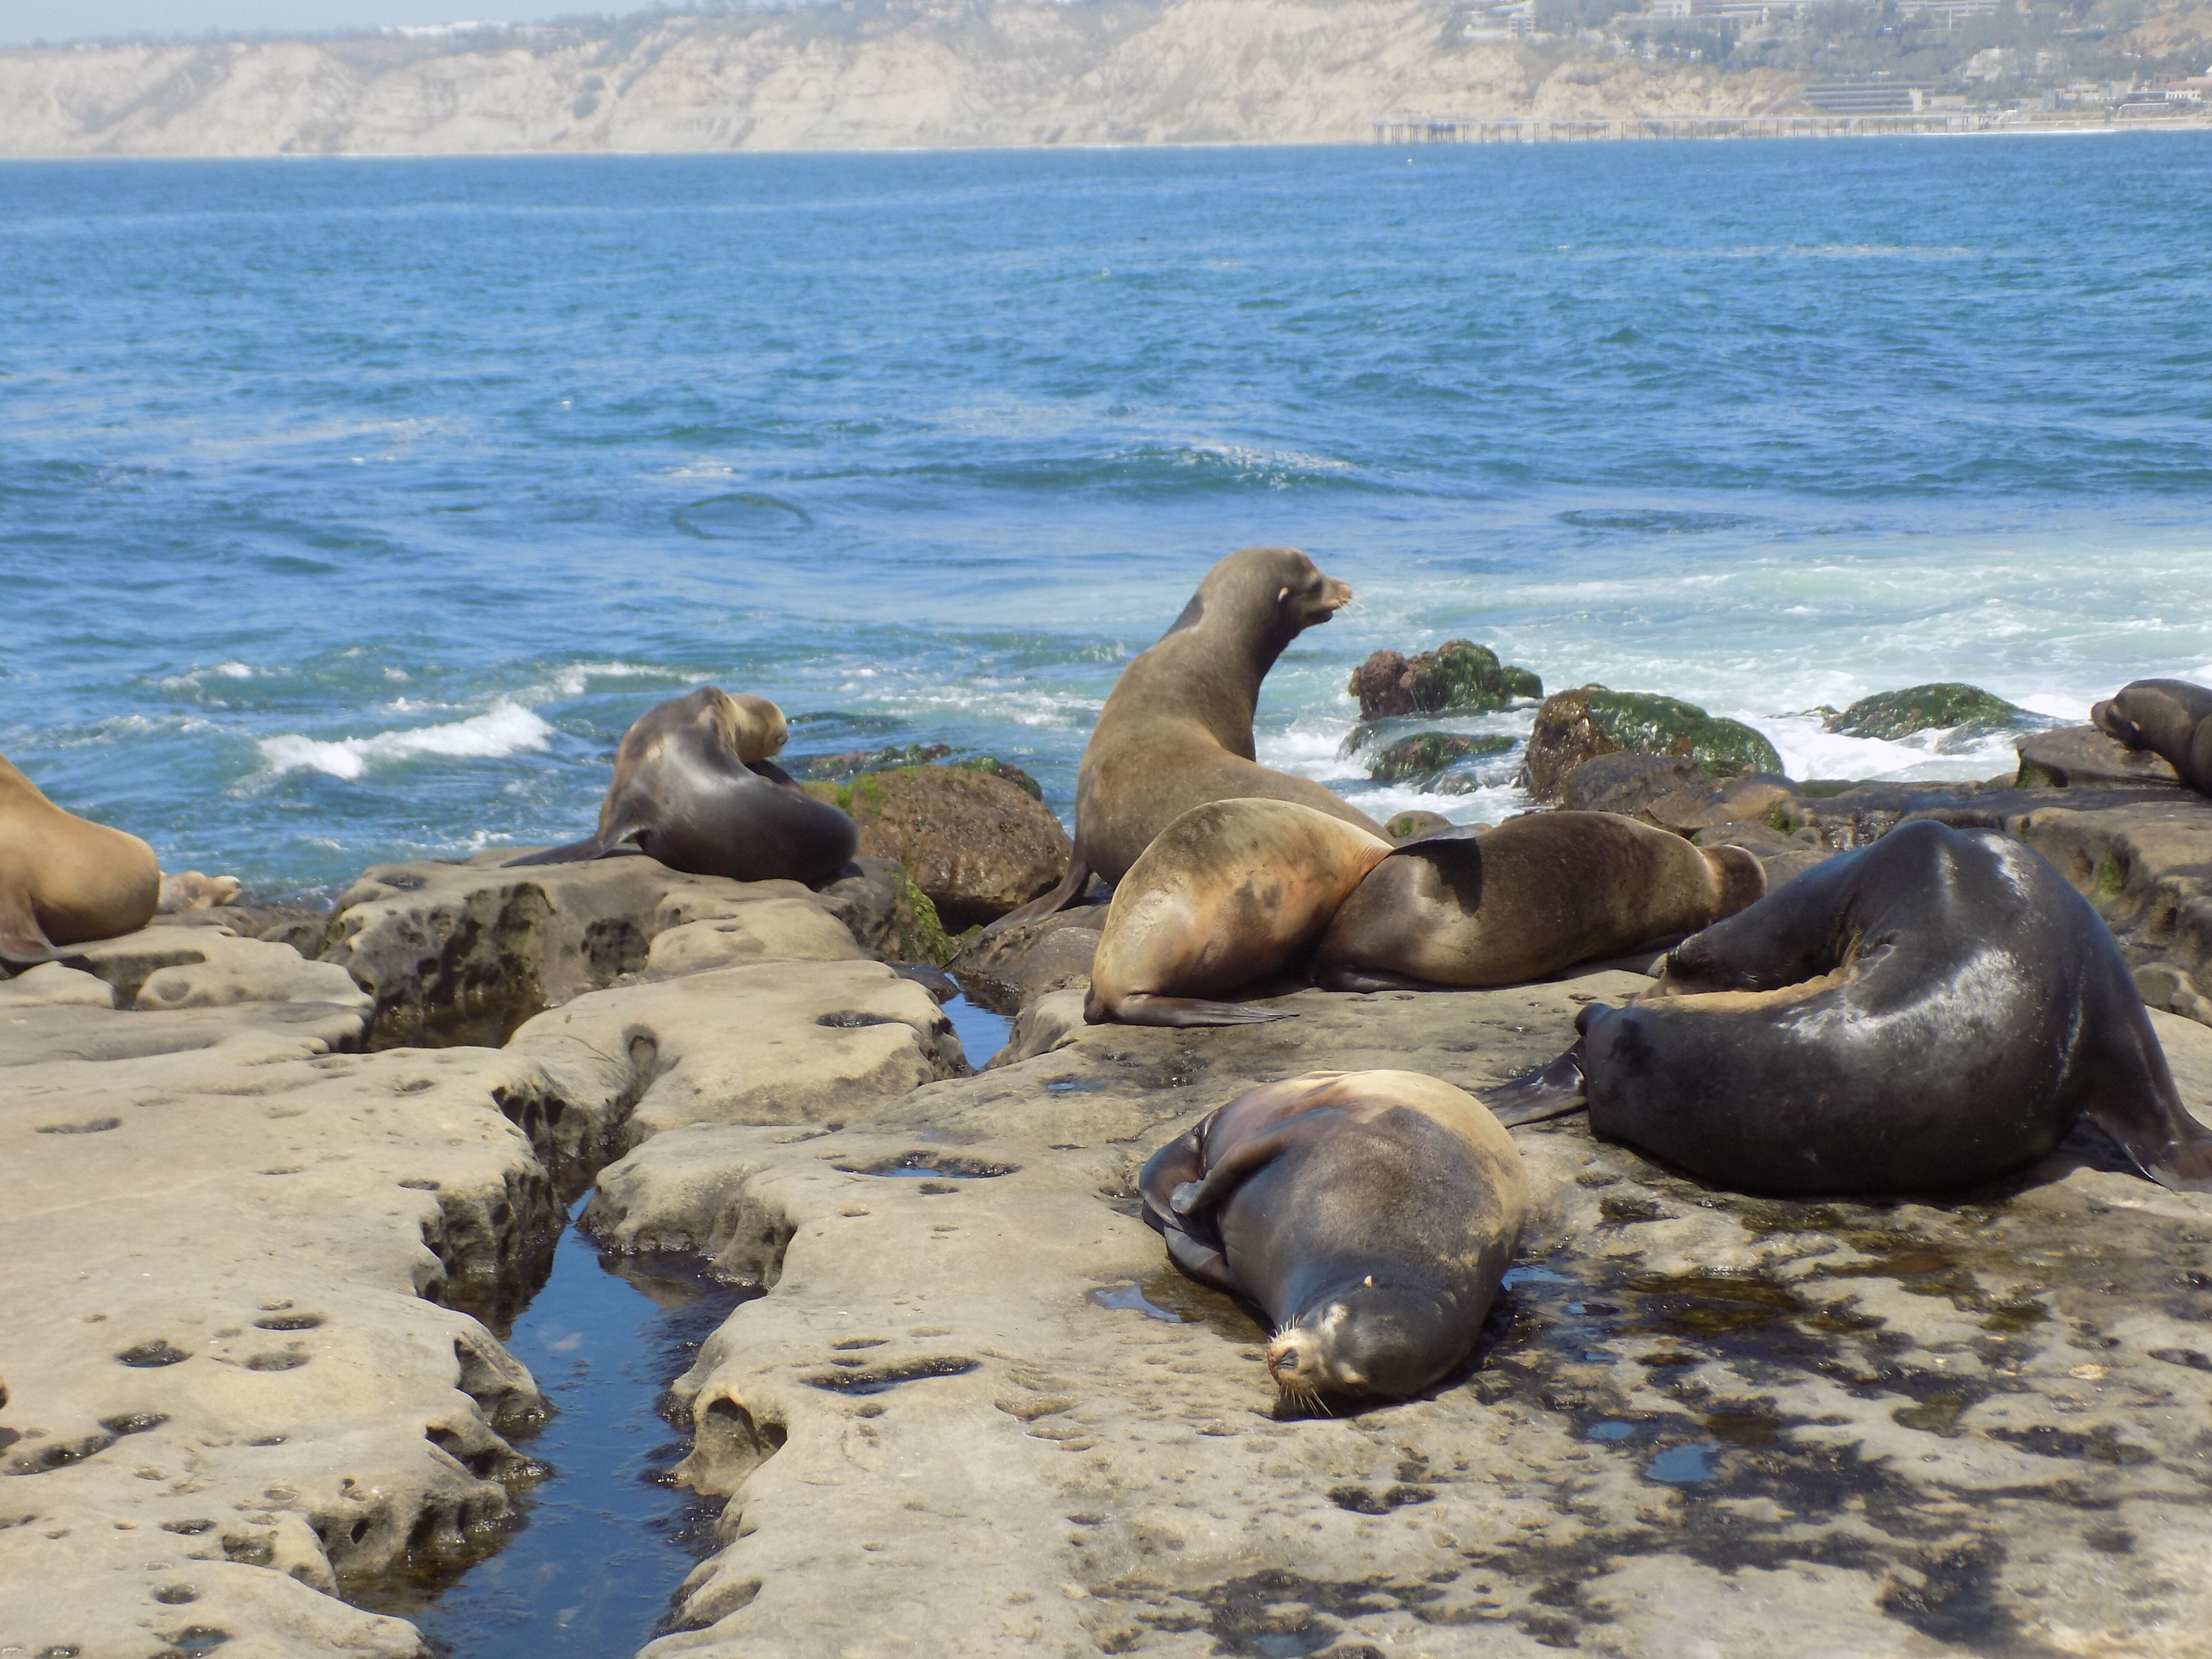 Seals_SeaLions.jpeg